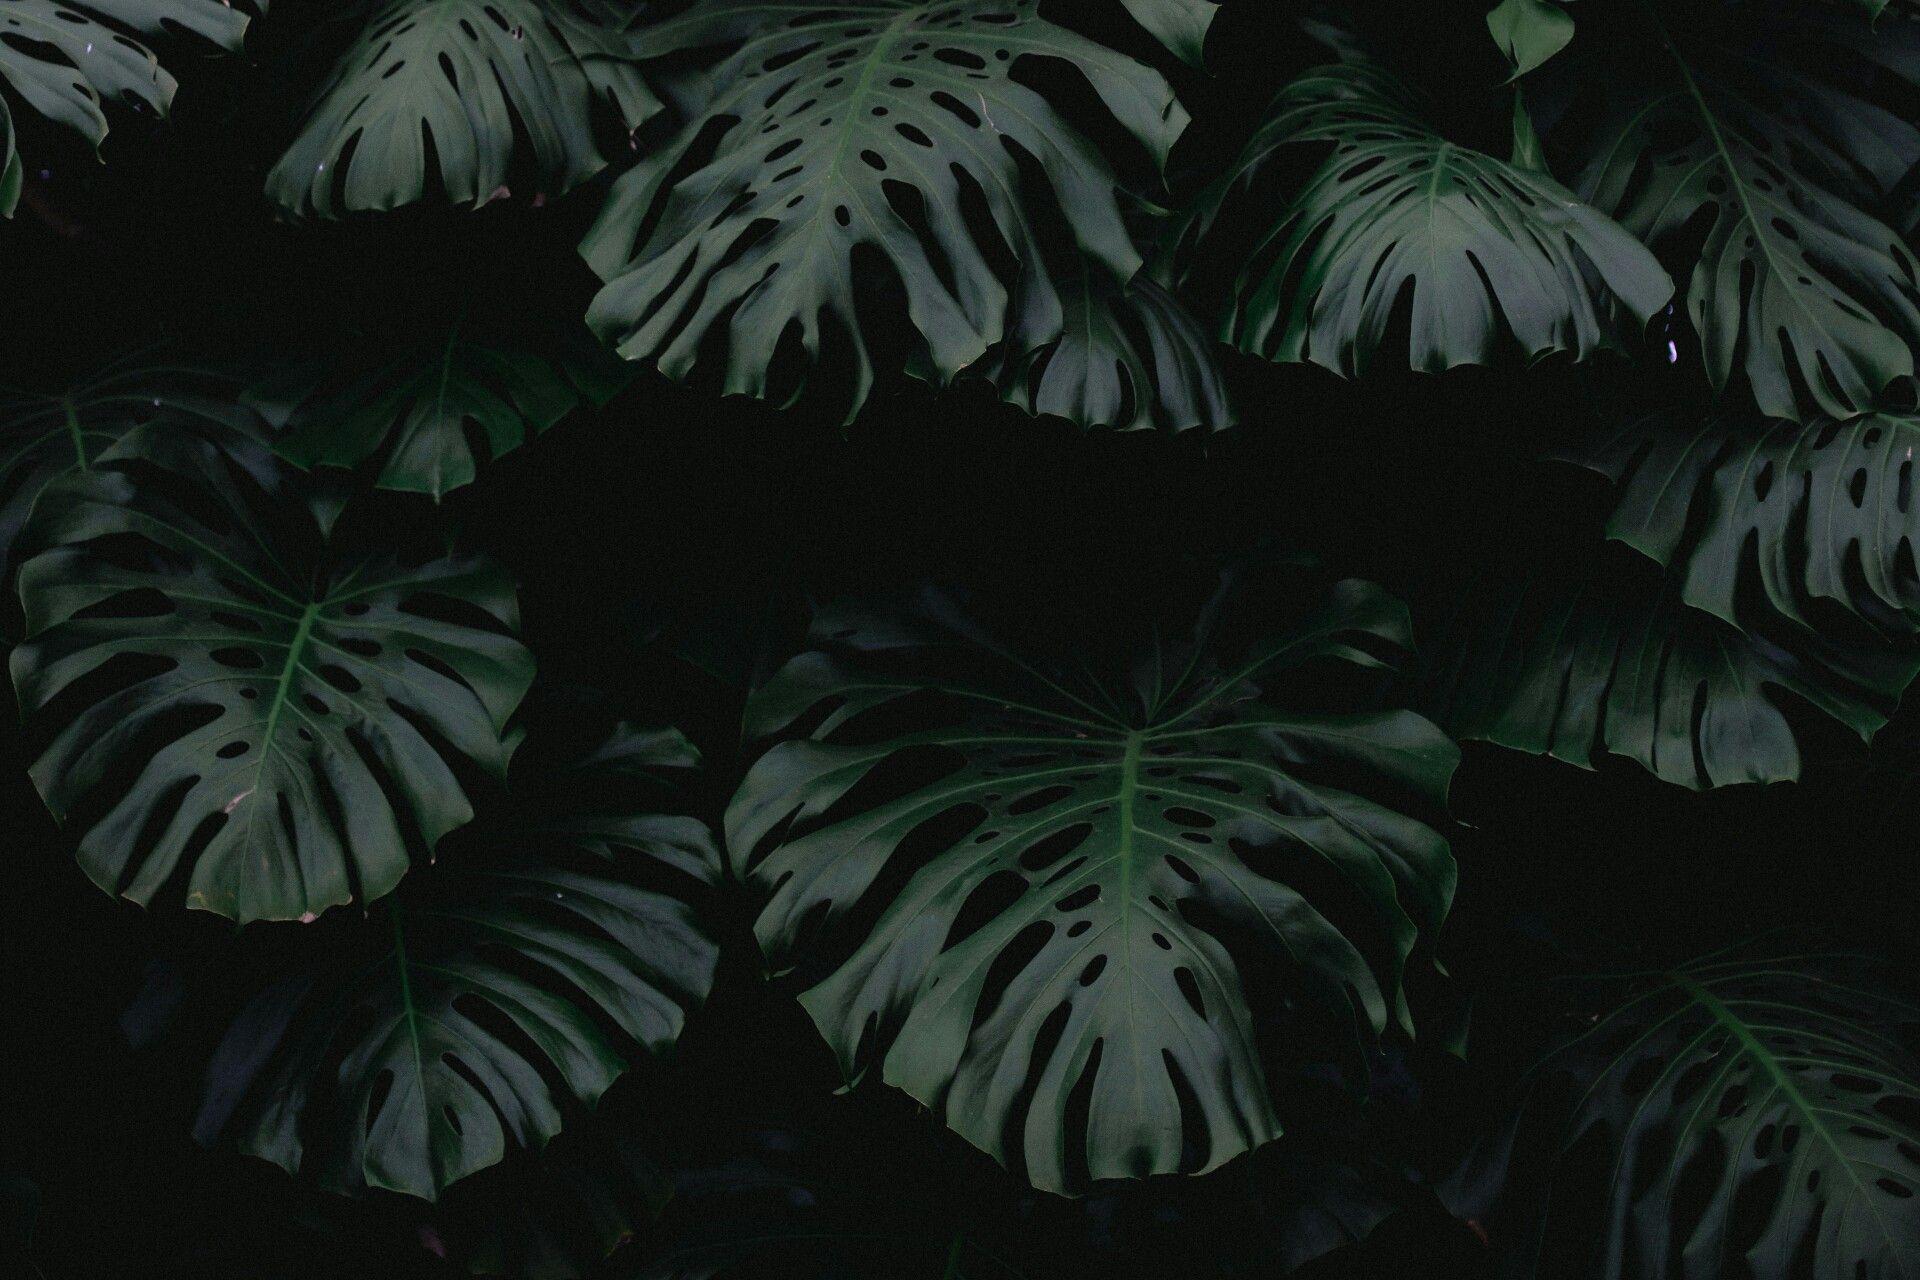 Pin By Restless Witch On Dark Shadows Plant Wallpaper Dark Wallpaper Aesthetic Desktop Wallpaper